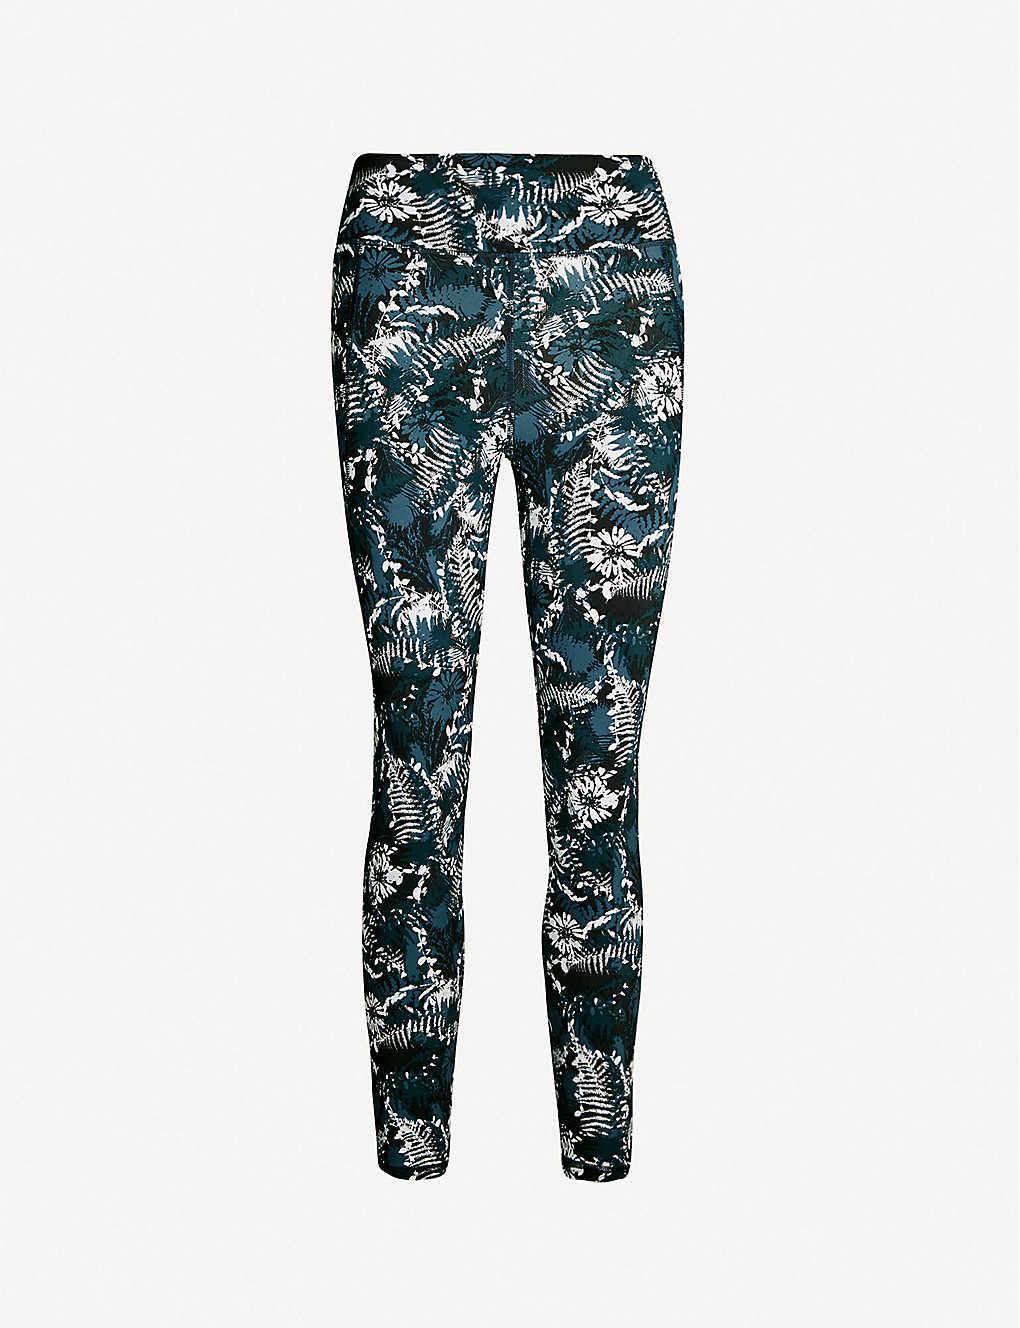 71463e9497c13a Zero Gravity stretch-jersey running leggings - Stargazer wild ...